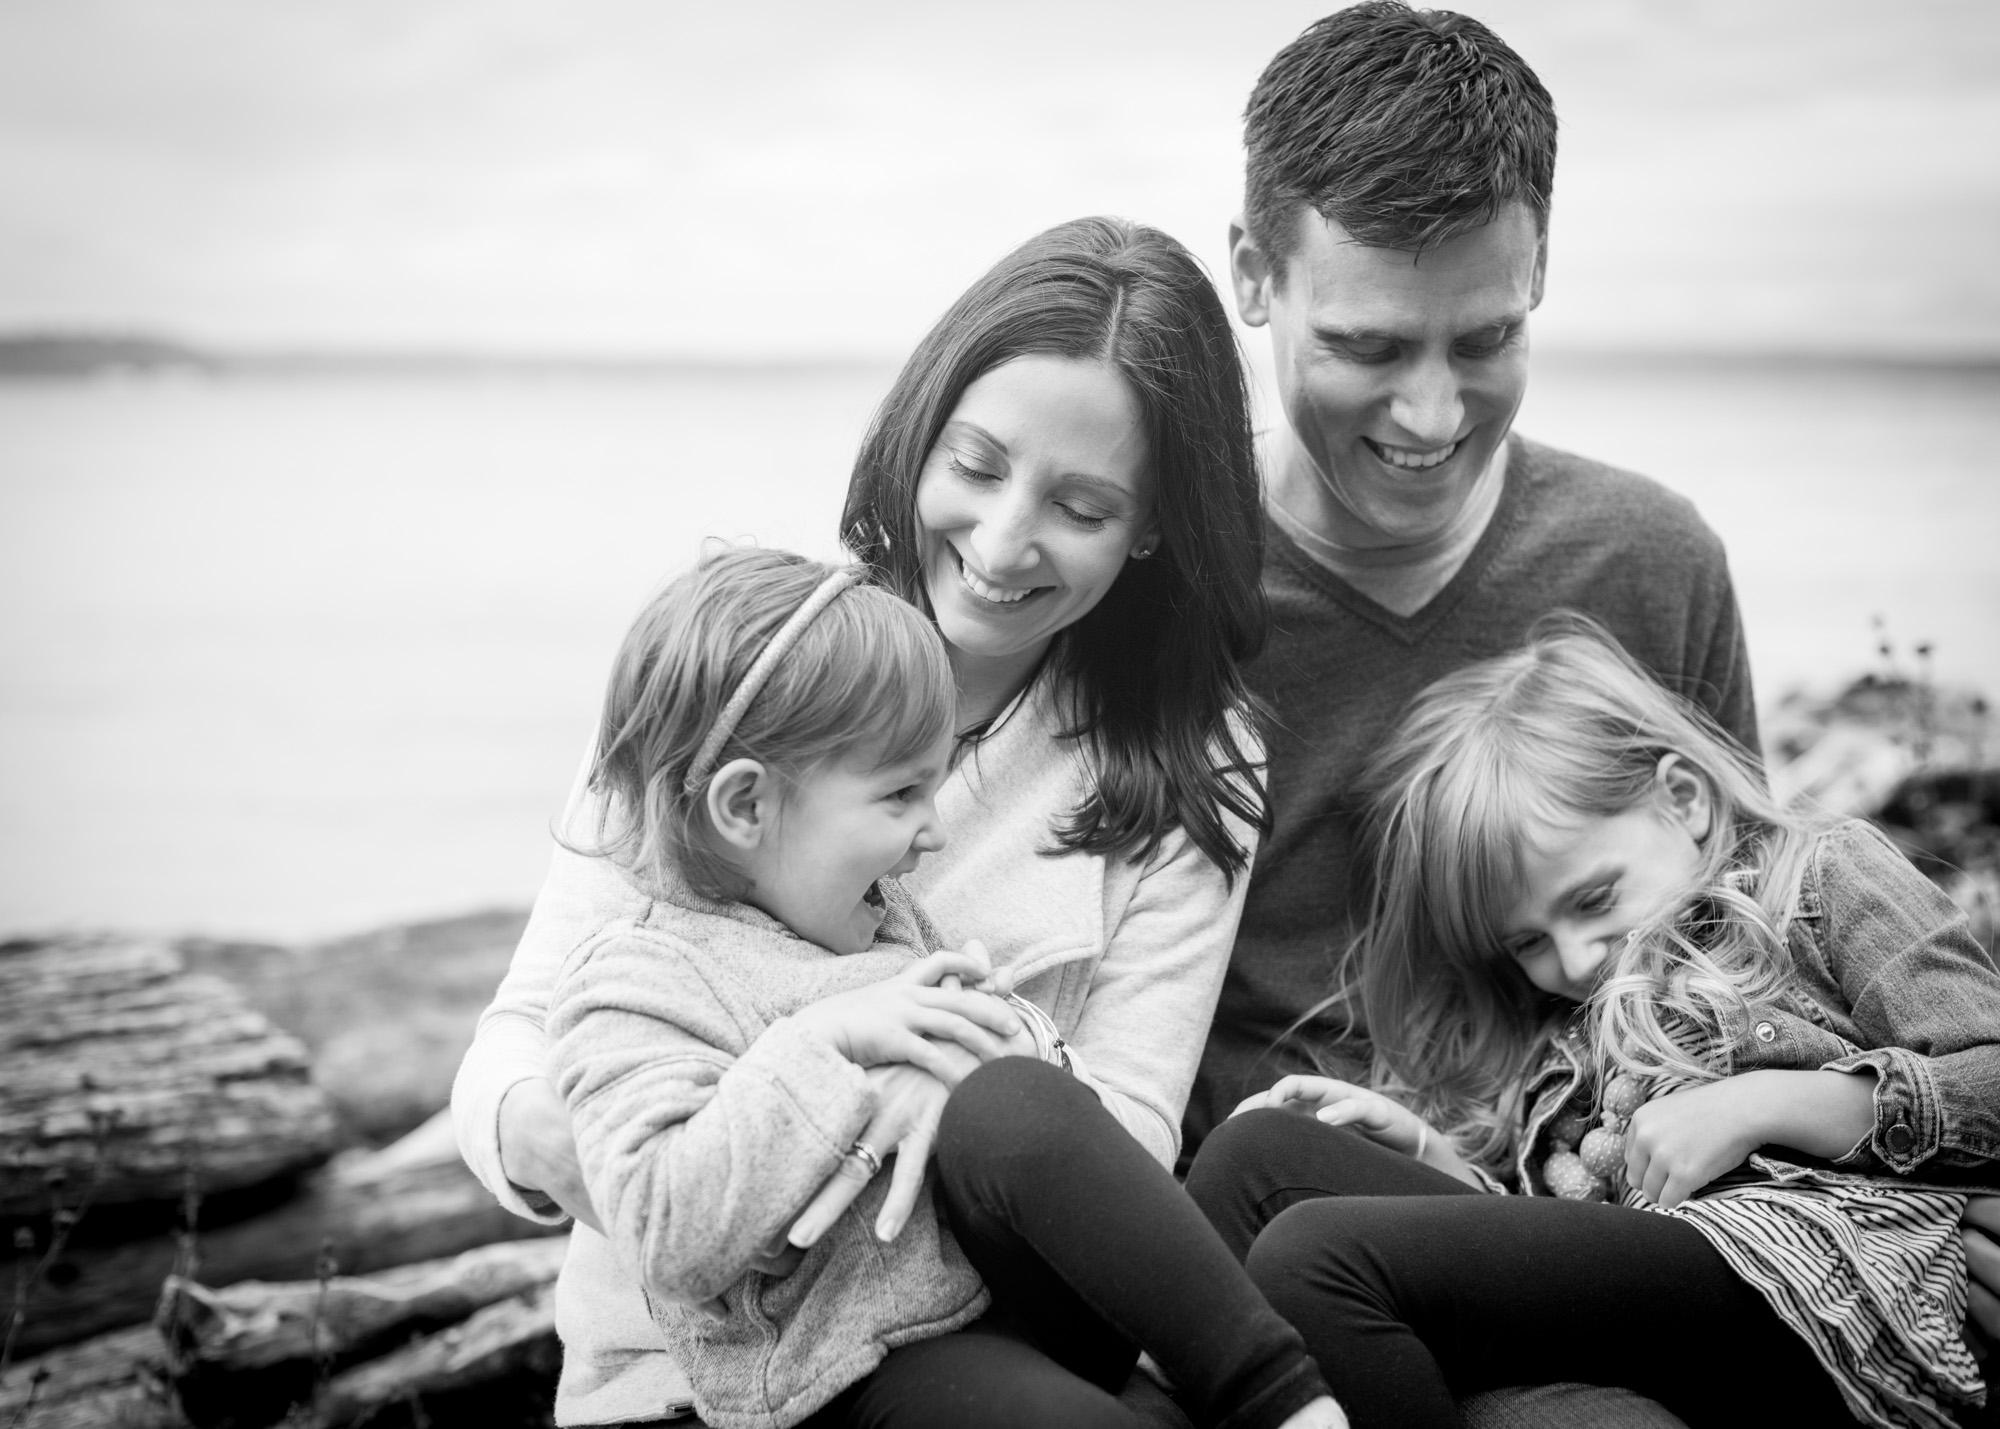 tacoma-playful-family-photography-session-8.jpg